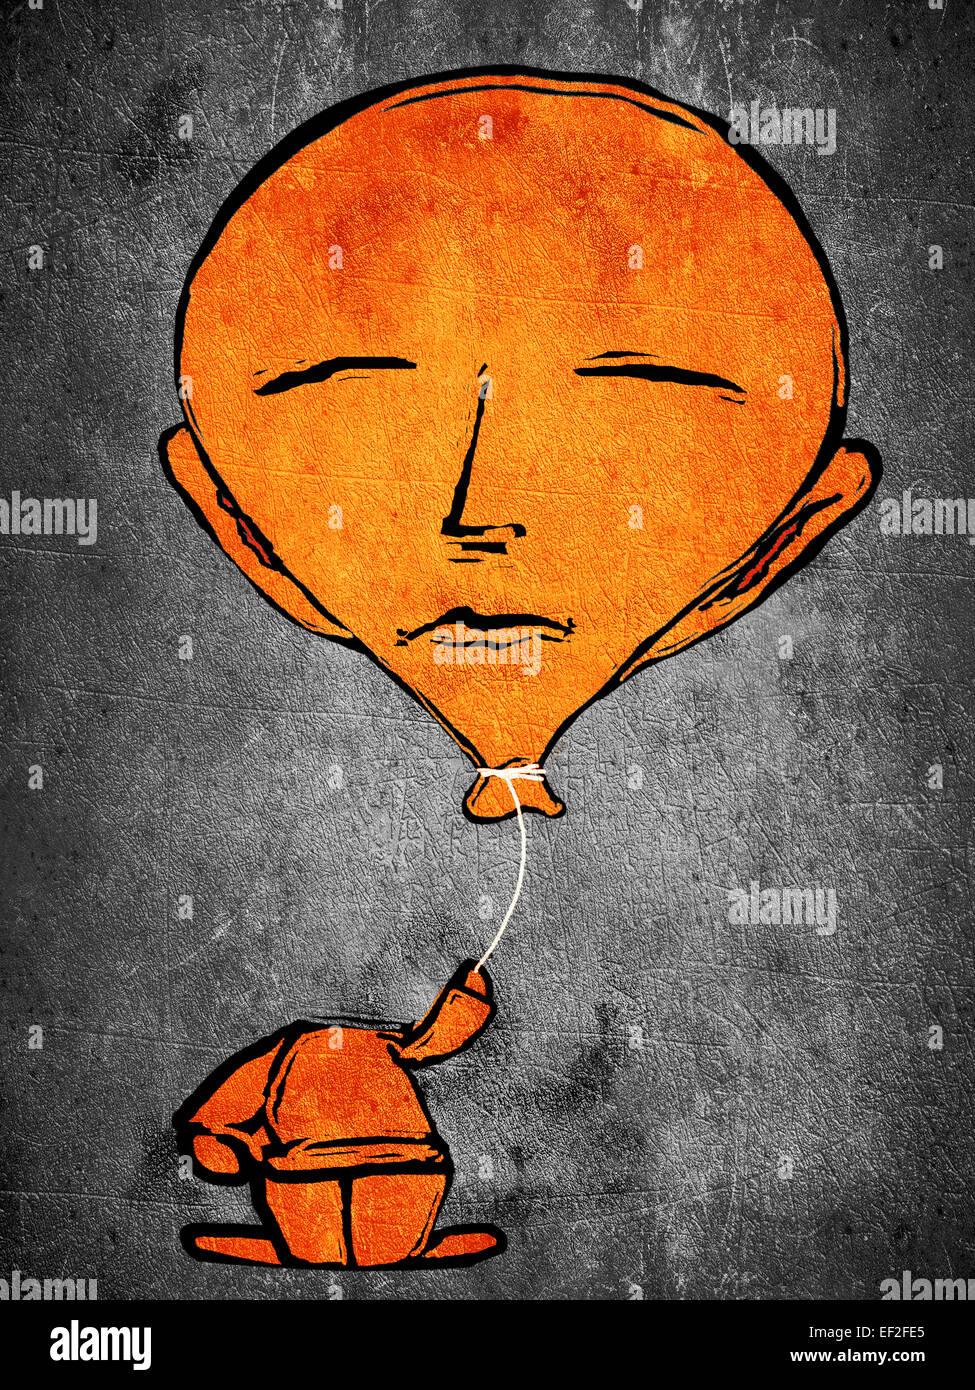 Sleeping orange Uomo con testa a palloncino Immagini Stock